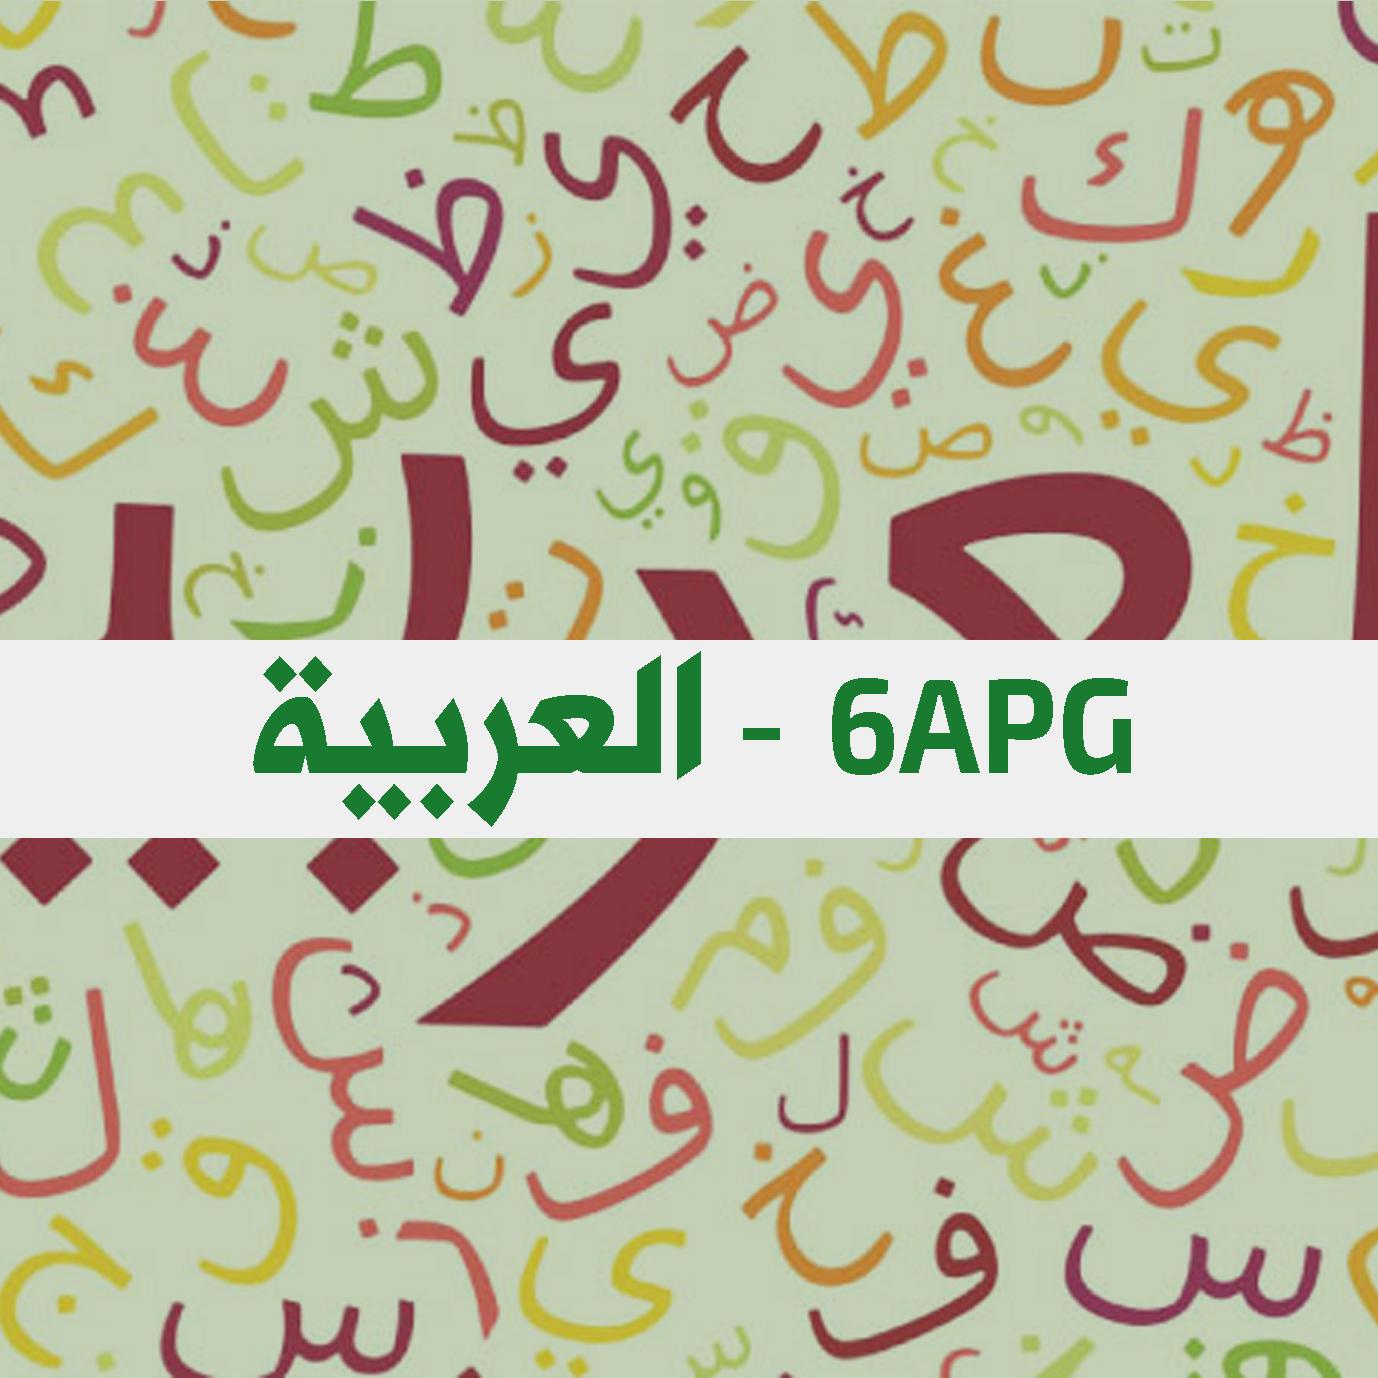 6APG-ARABE course image